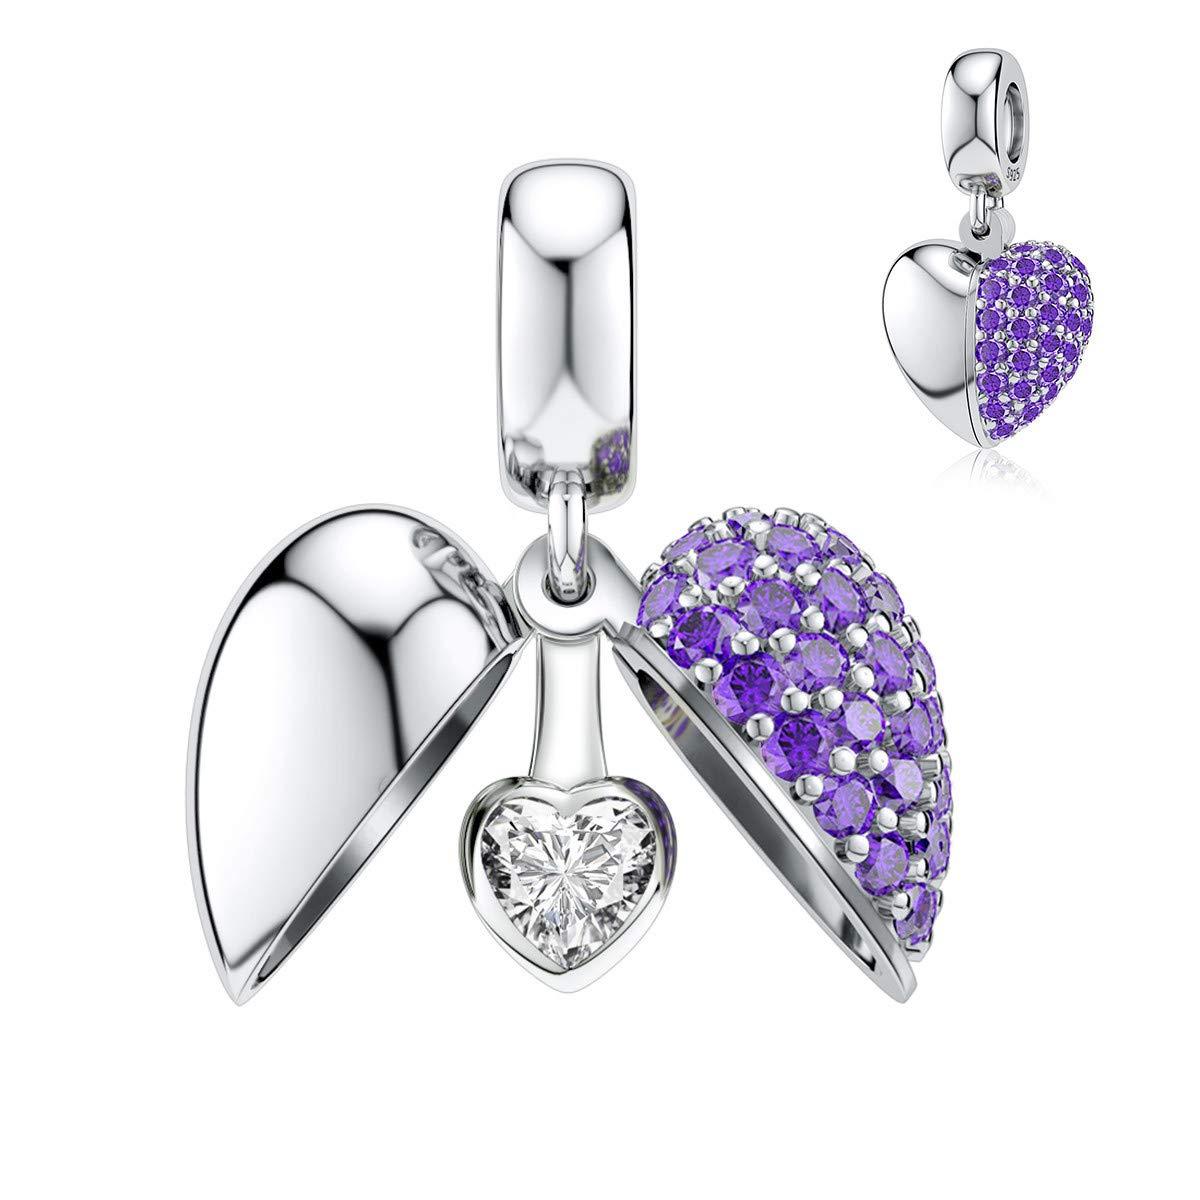 DALARAN Purple Heart Charm for Pandora Bracelet Sterling Silver Love Dangle Bead Charms for Women Girls Mothers Day Gift